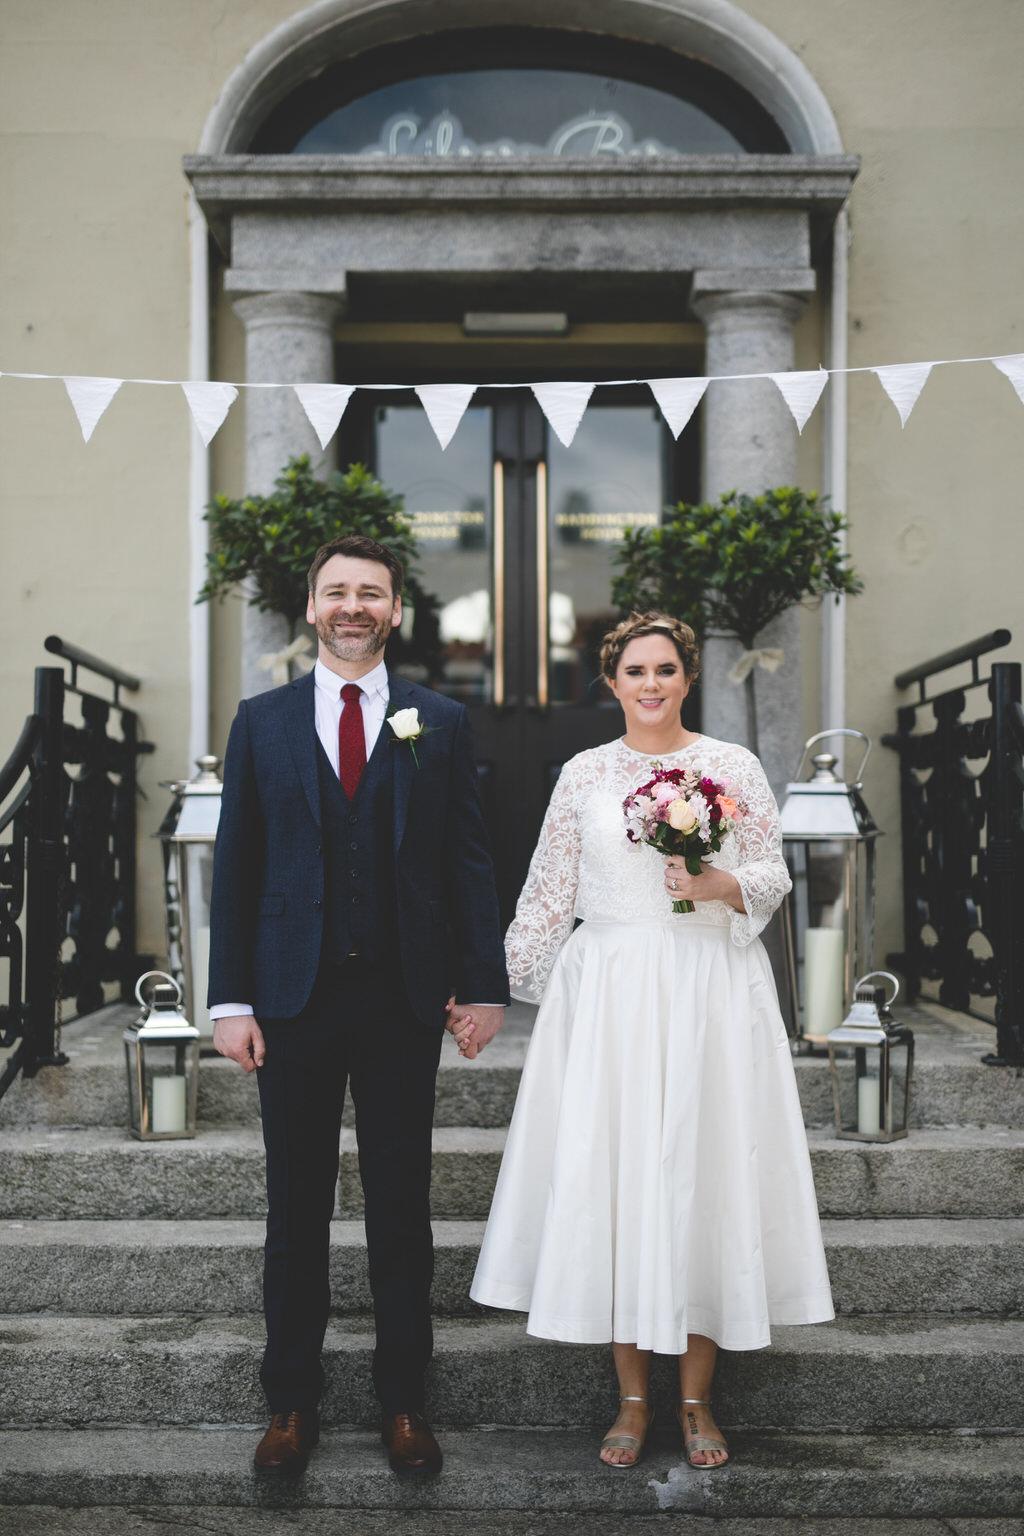 Dublin seaside wedding venue - the Haddington House